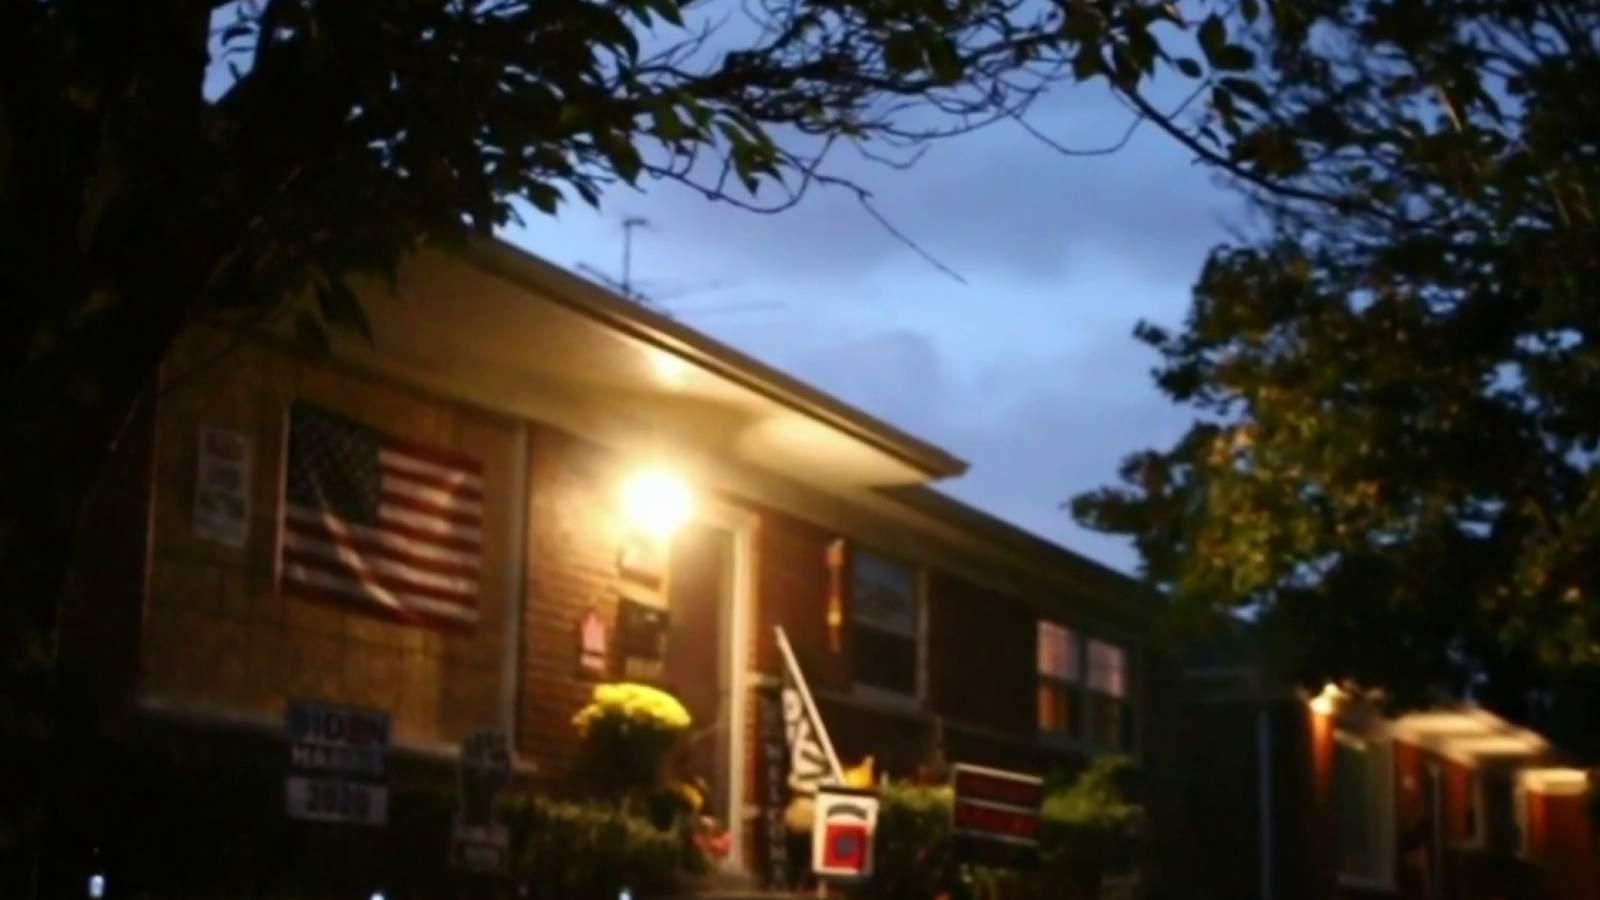 One person arrested in Warren hate crime investigation